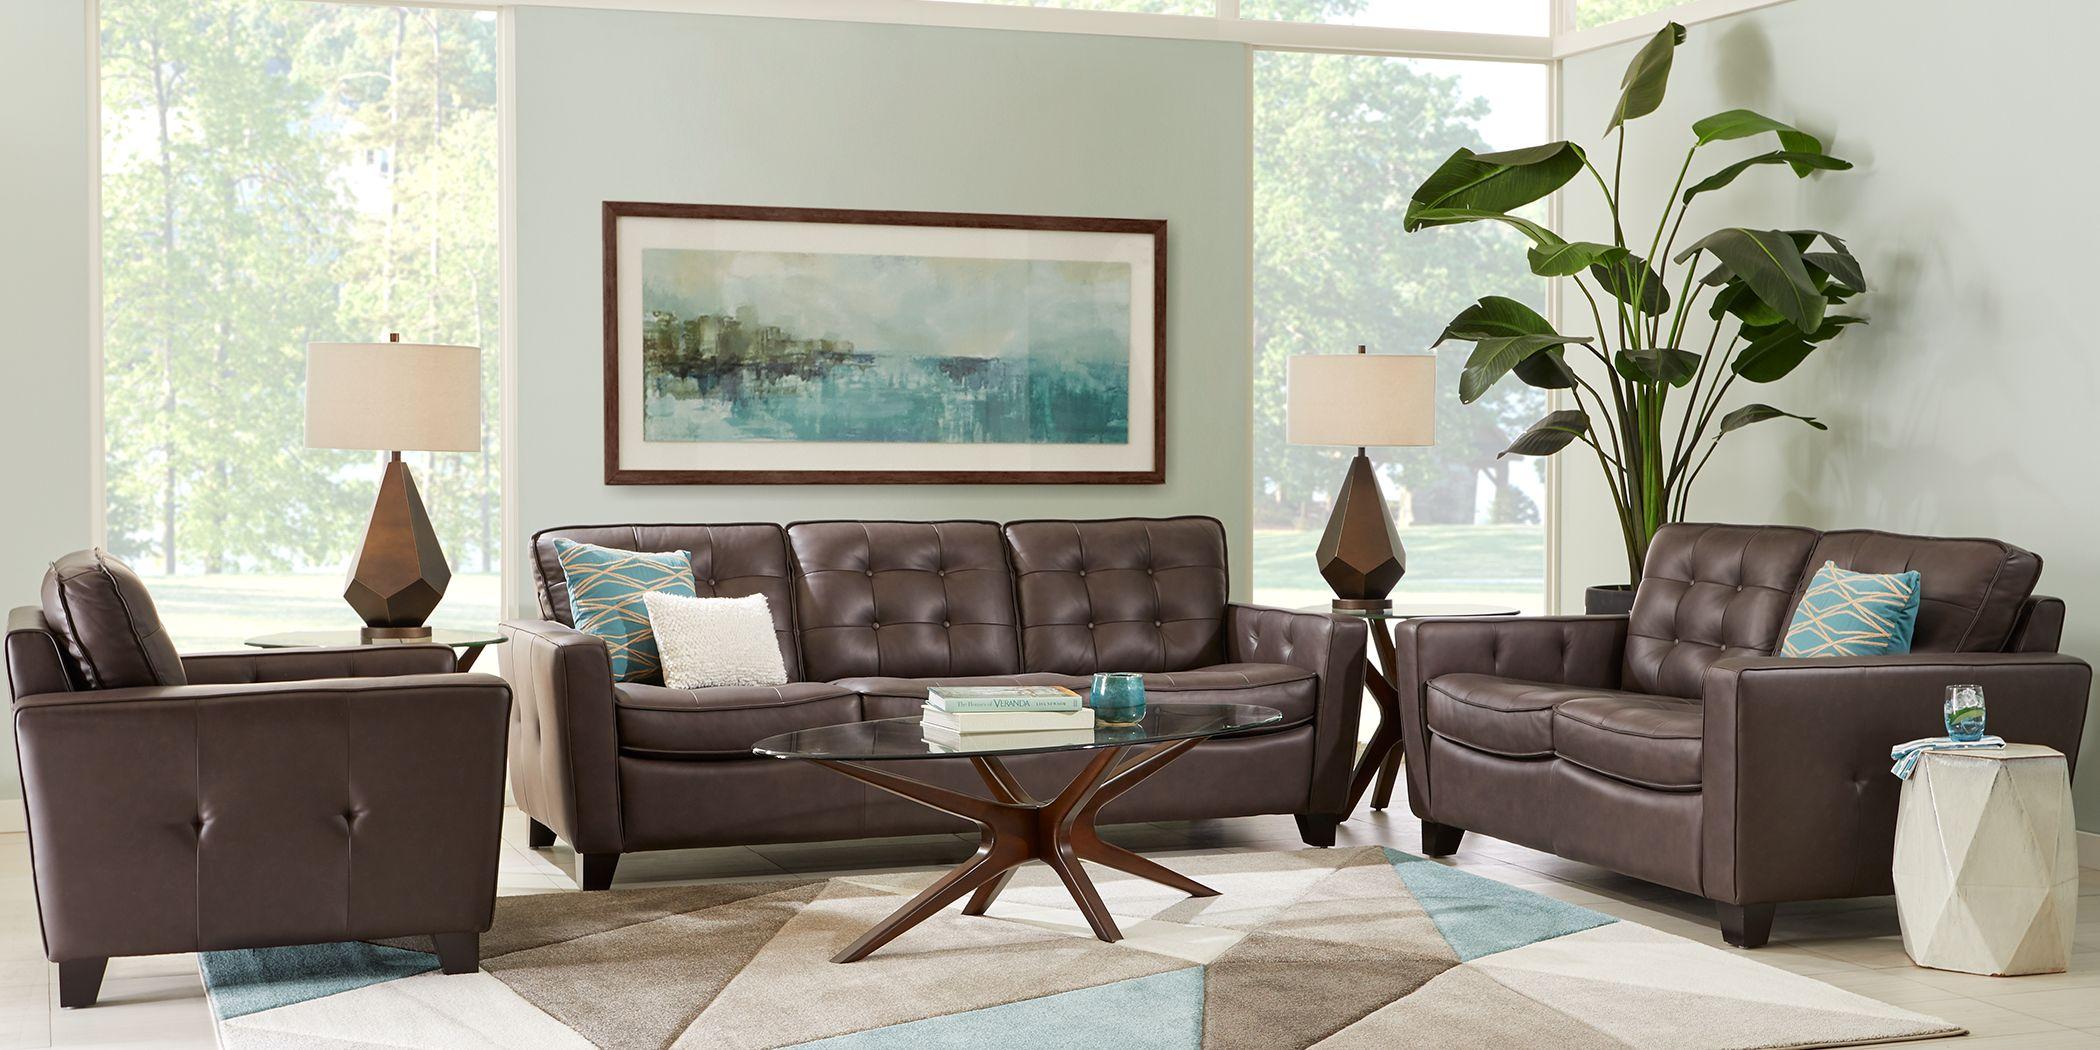 Via Rosano Coffee 3 Pc Leather Living Room